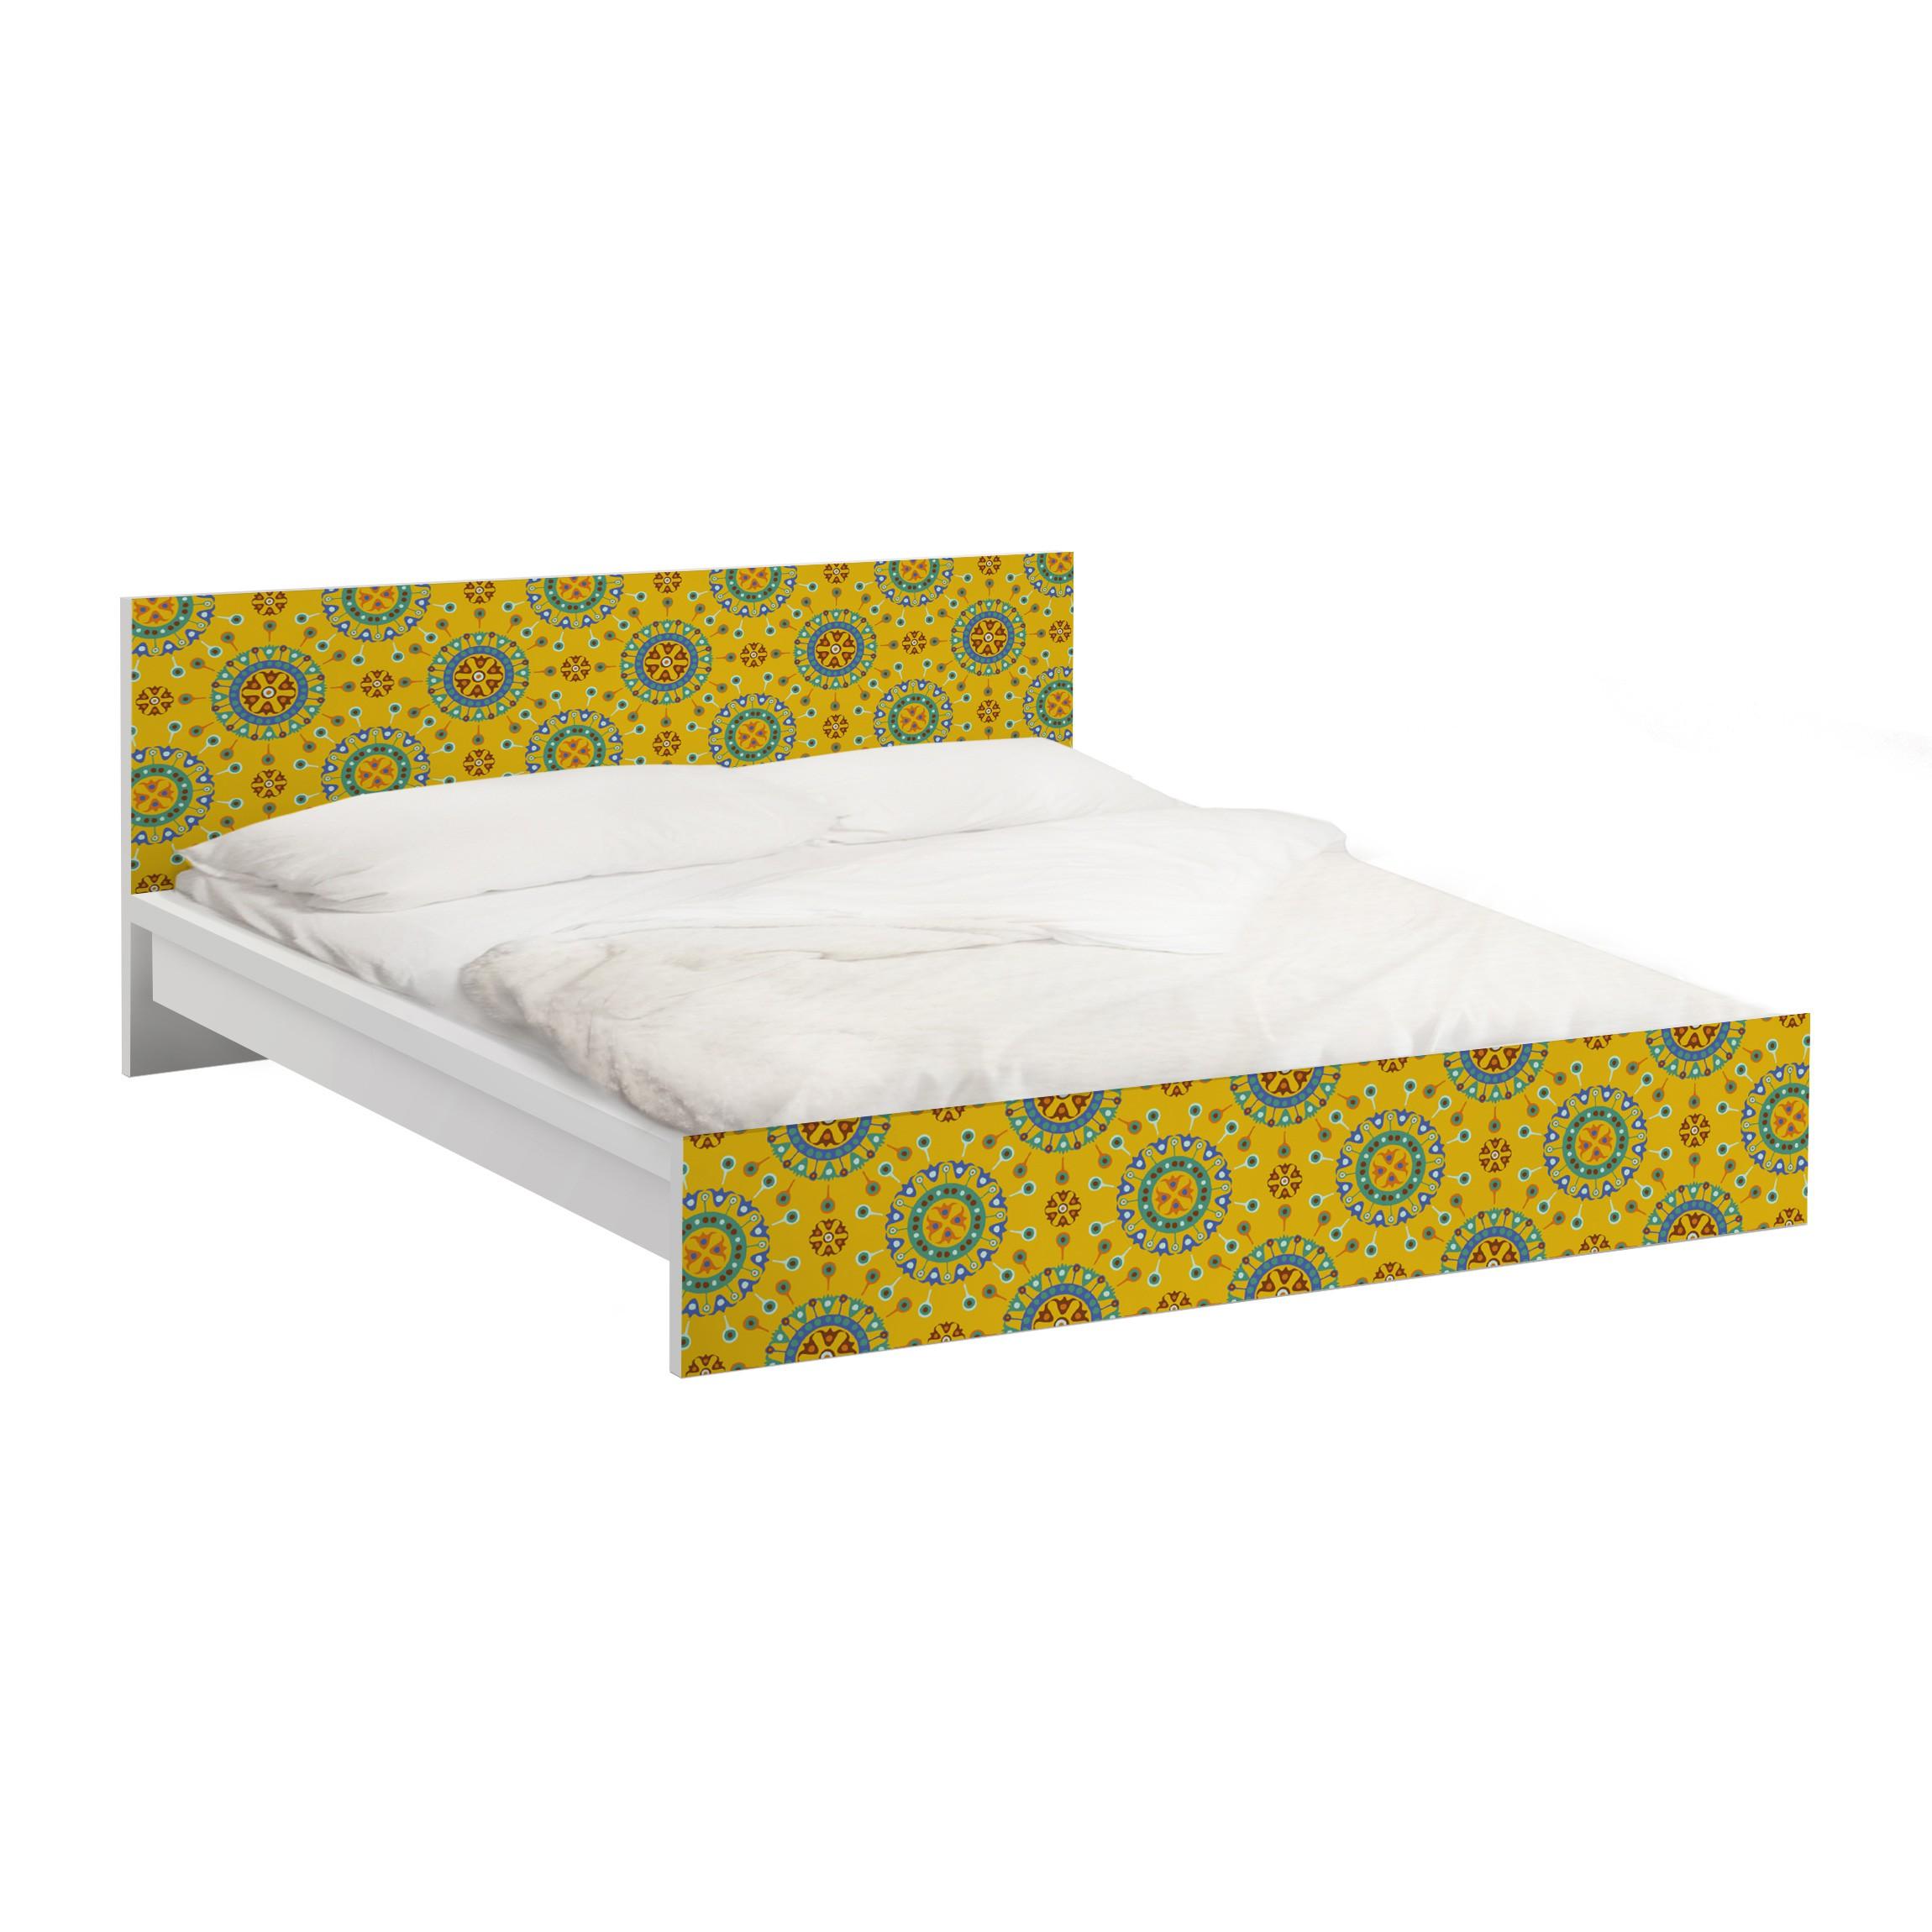 m belfolie f r ikea malm bett niedrig 140x200cm klebefolie wayuu design. Black Bedroom Furniture Sets. Home Design Ideas